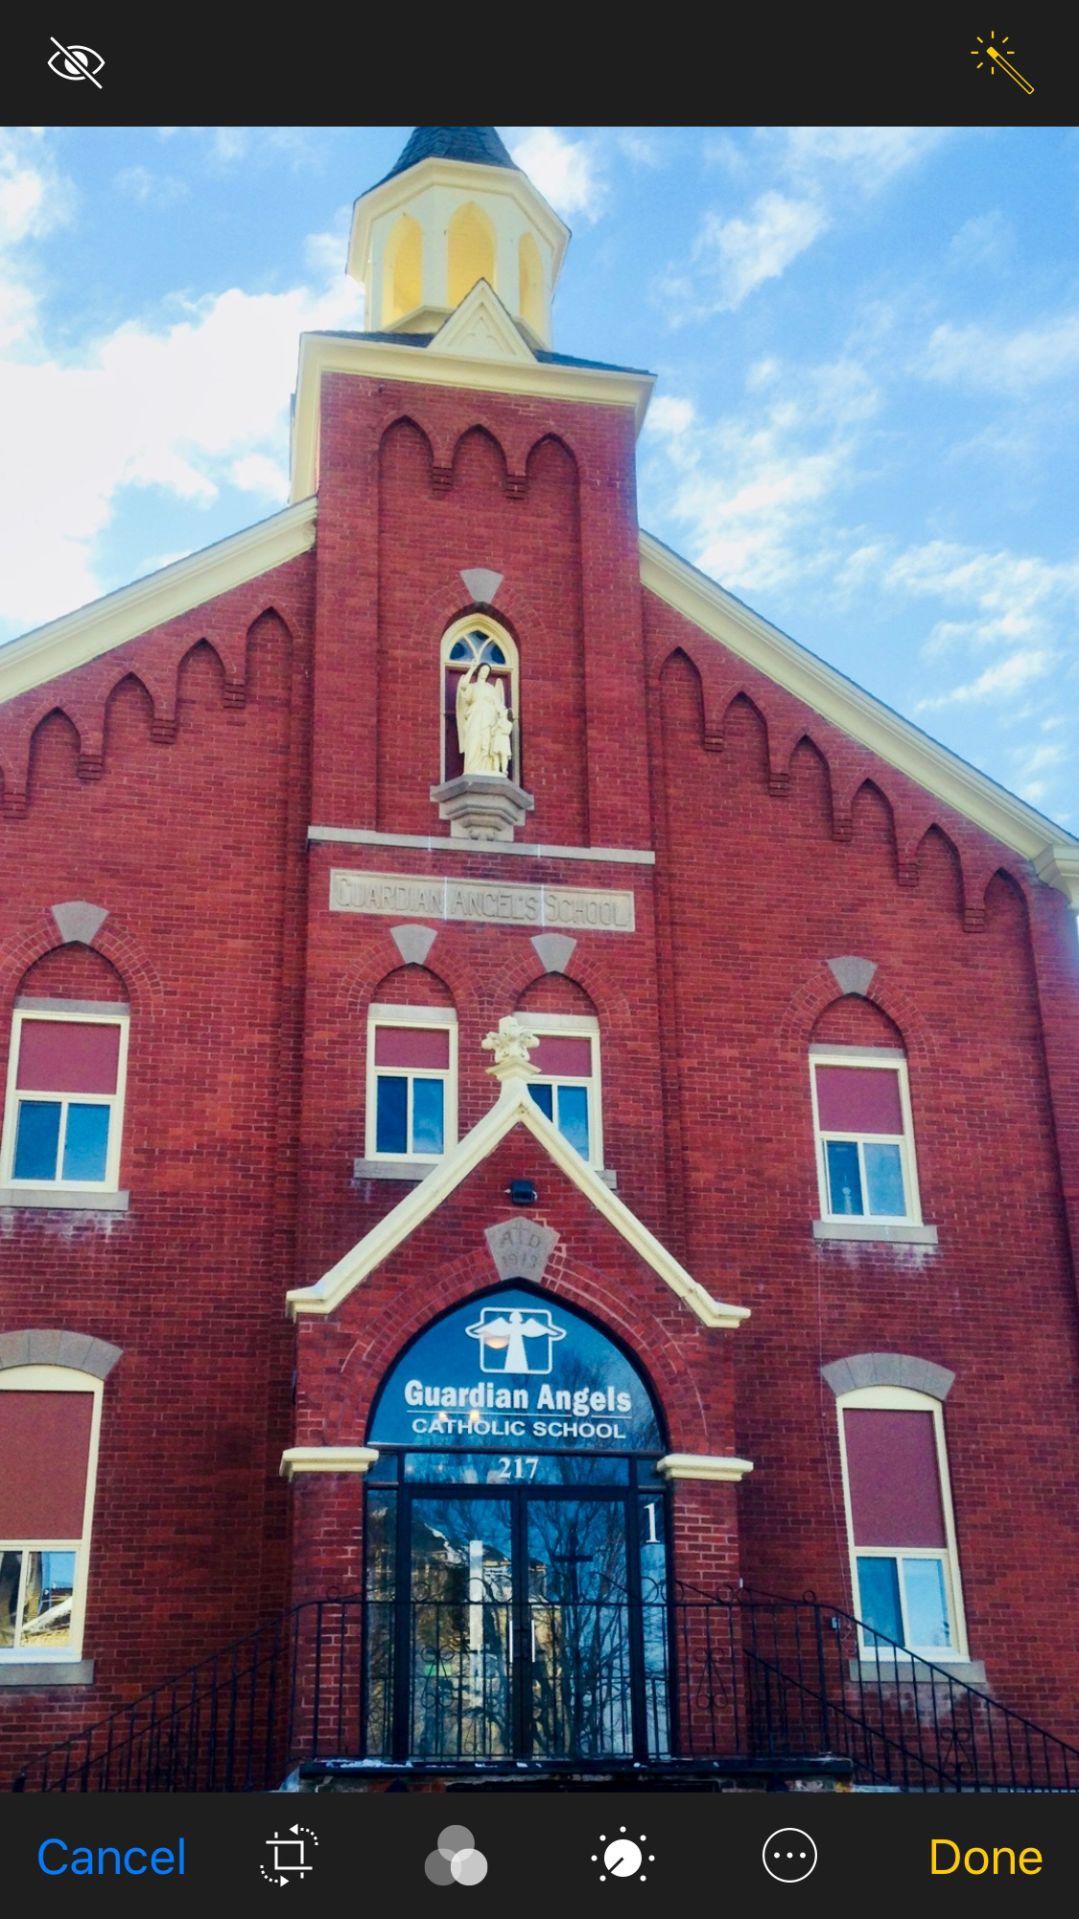 Faithful Beginnings at Guardian Angels - School